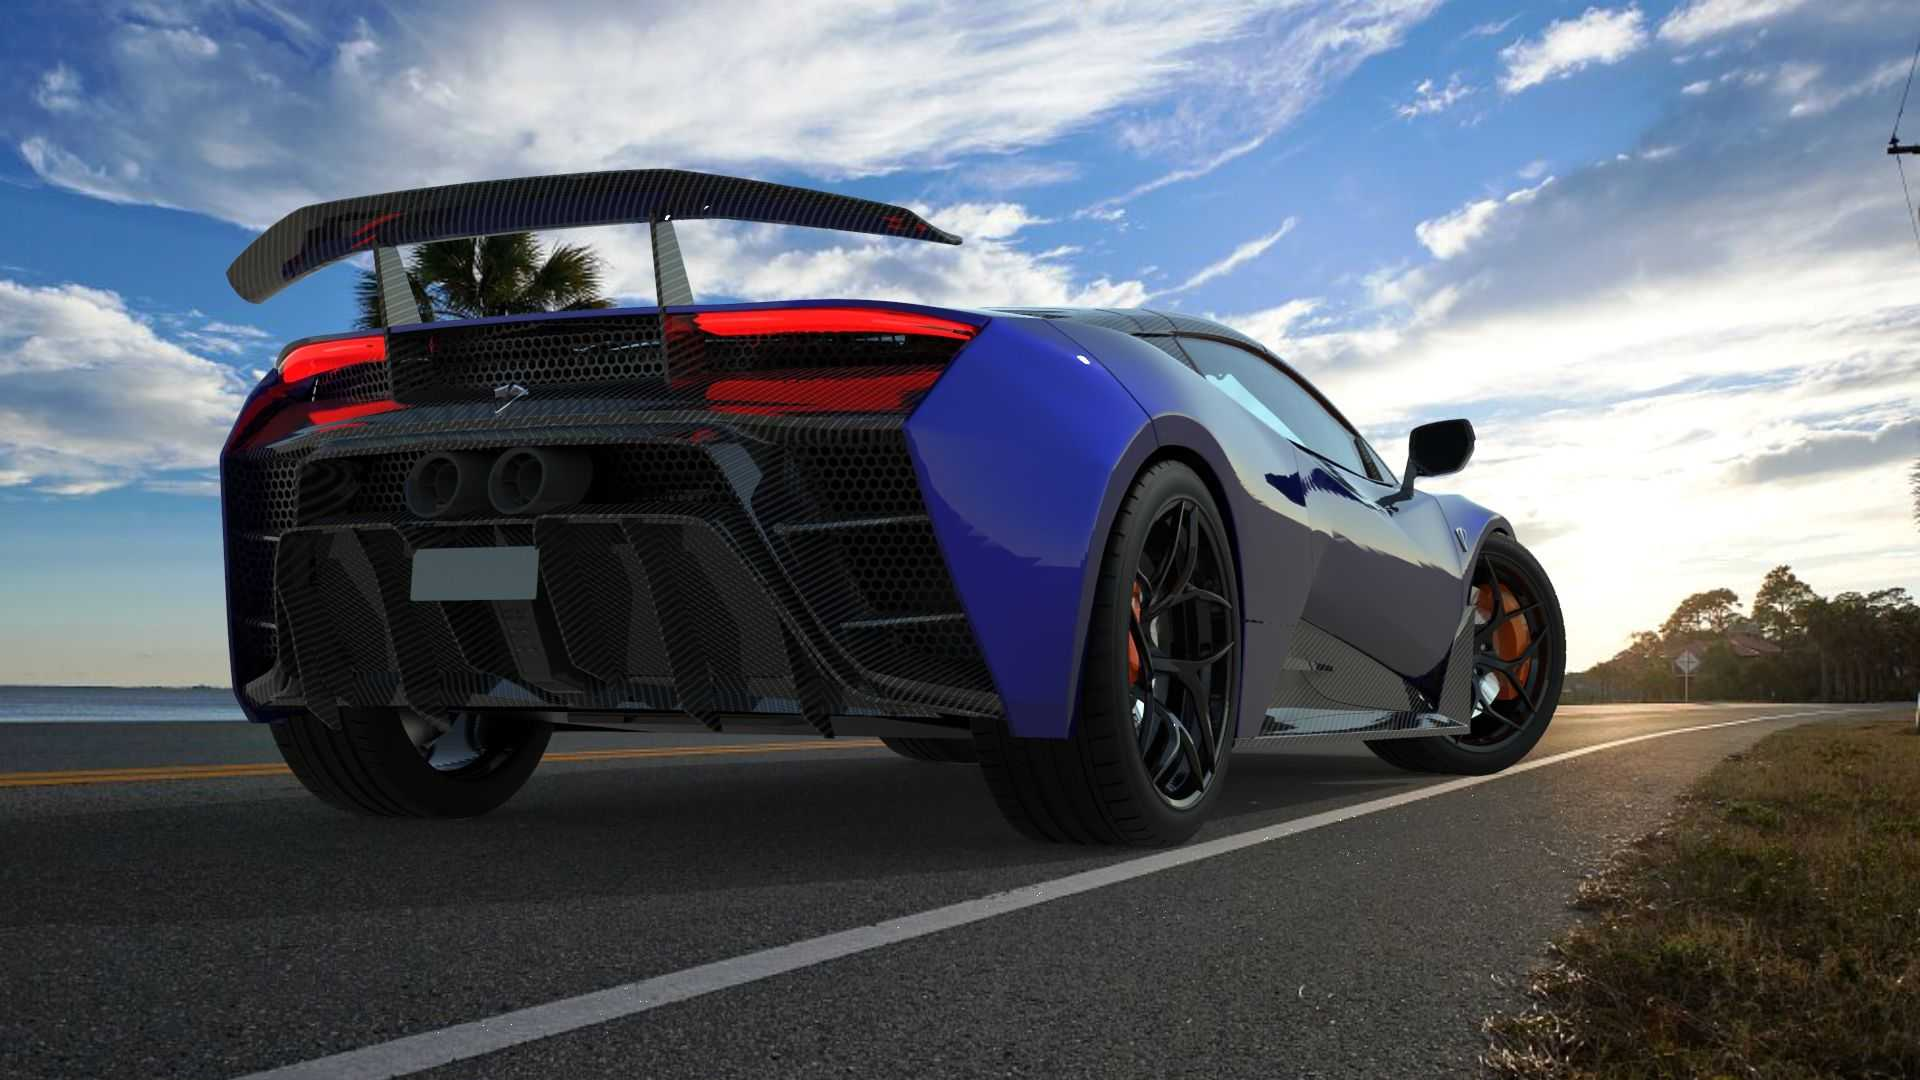 Arrera-Automobili-Illyrian-Pure-Sport-Renderings-13